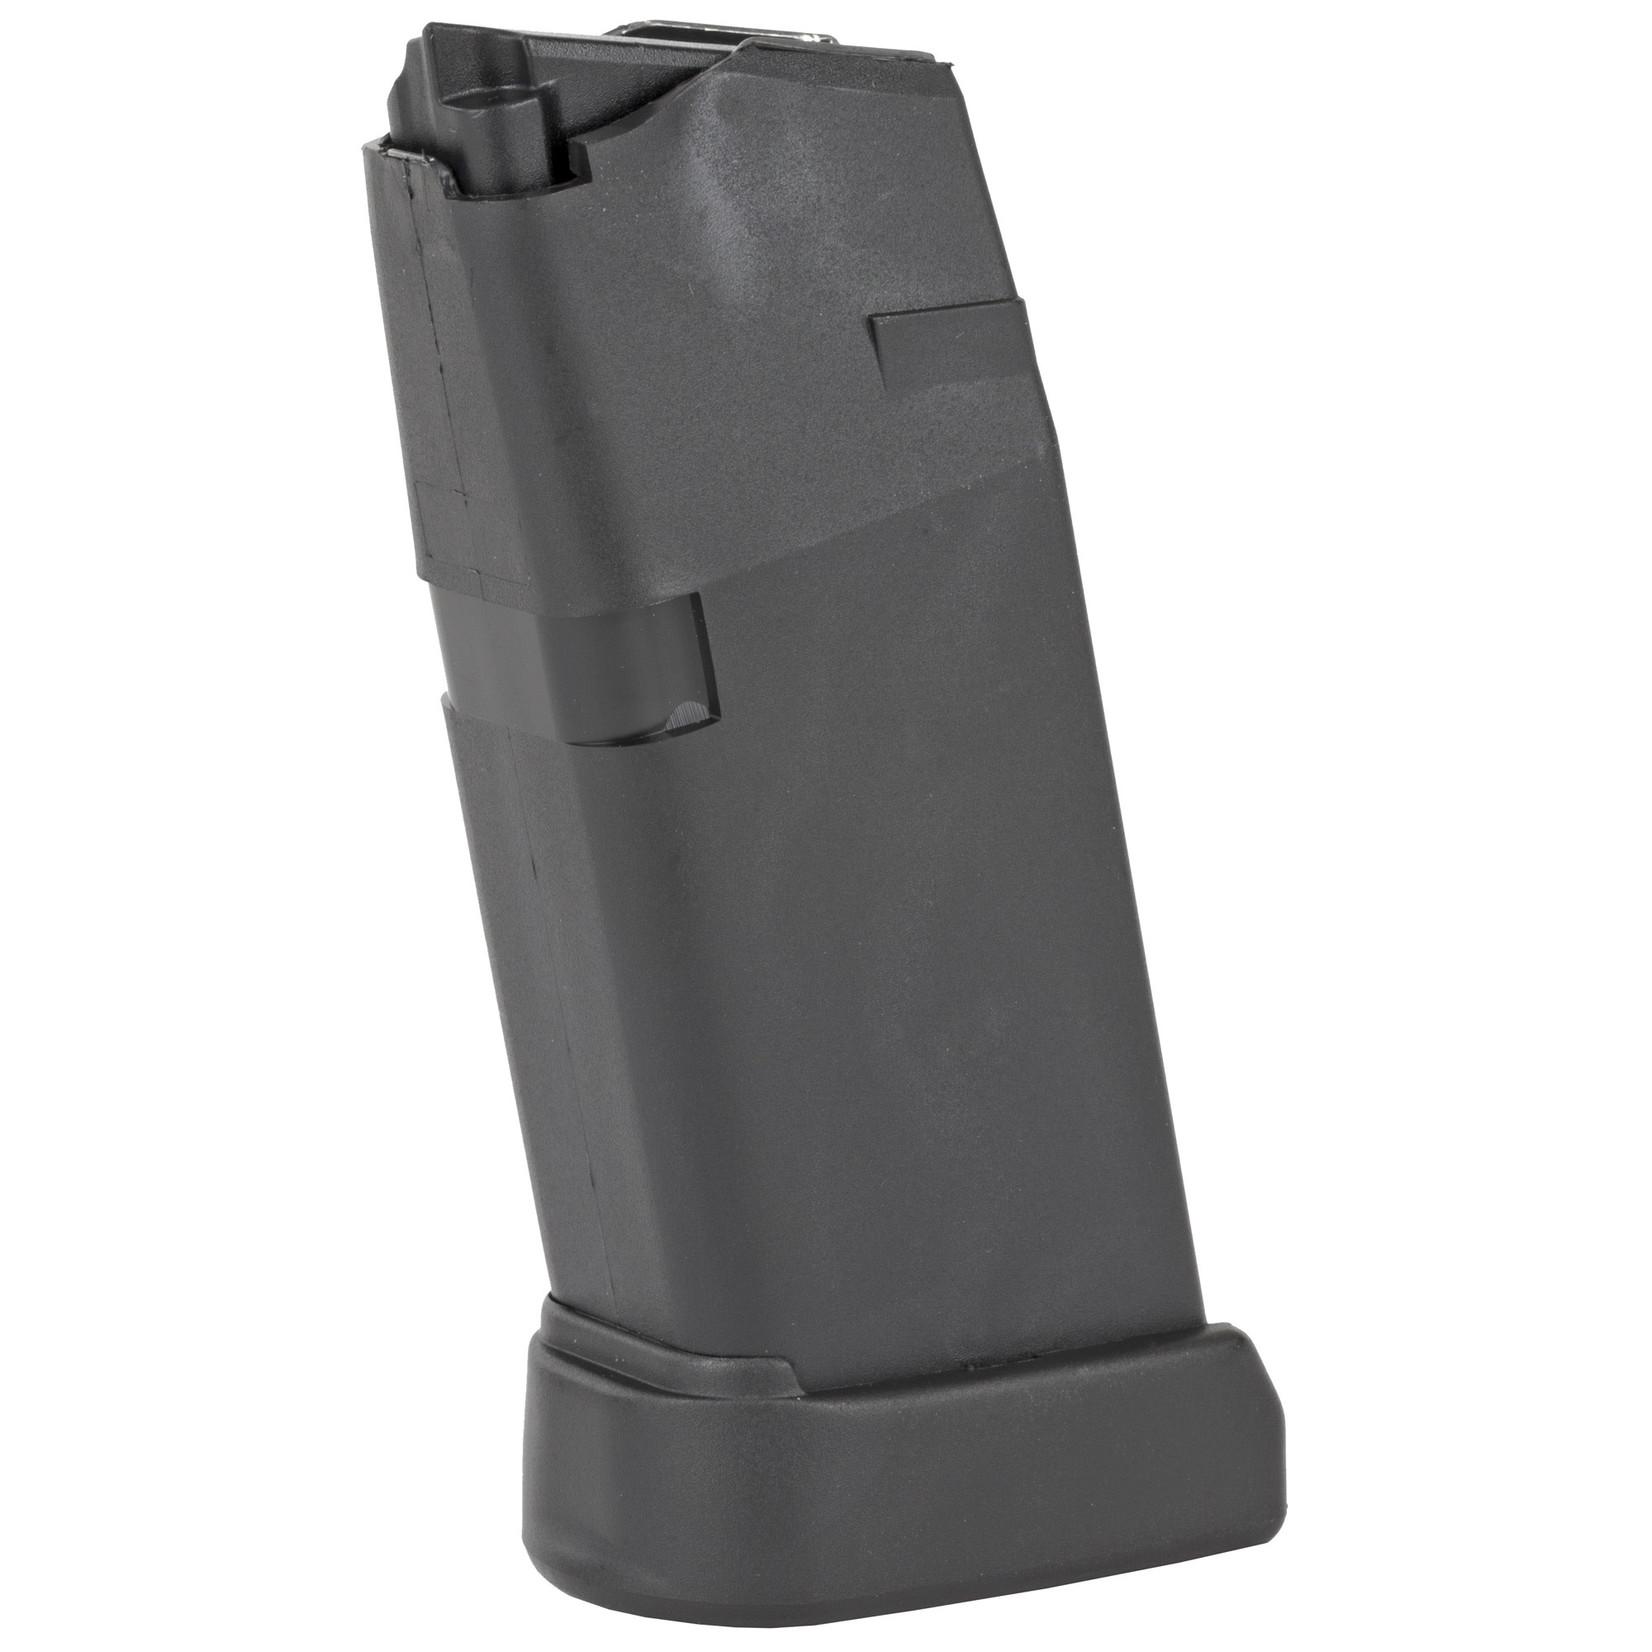 GLOCK Glock 30 45ACP 10RD MAG